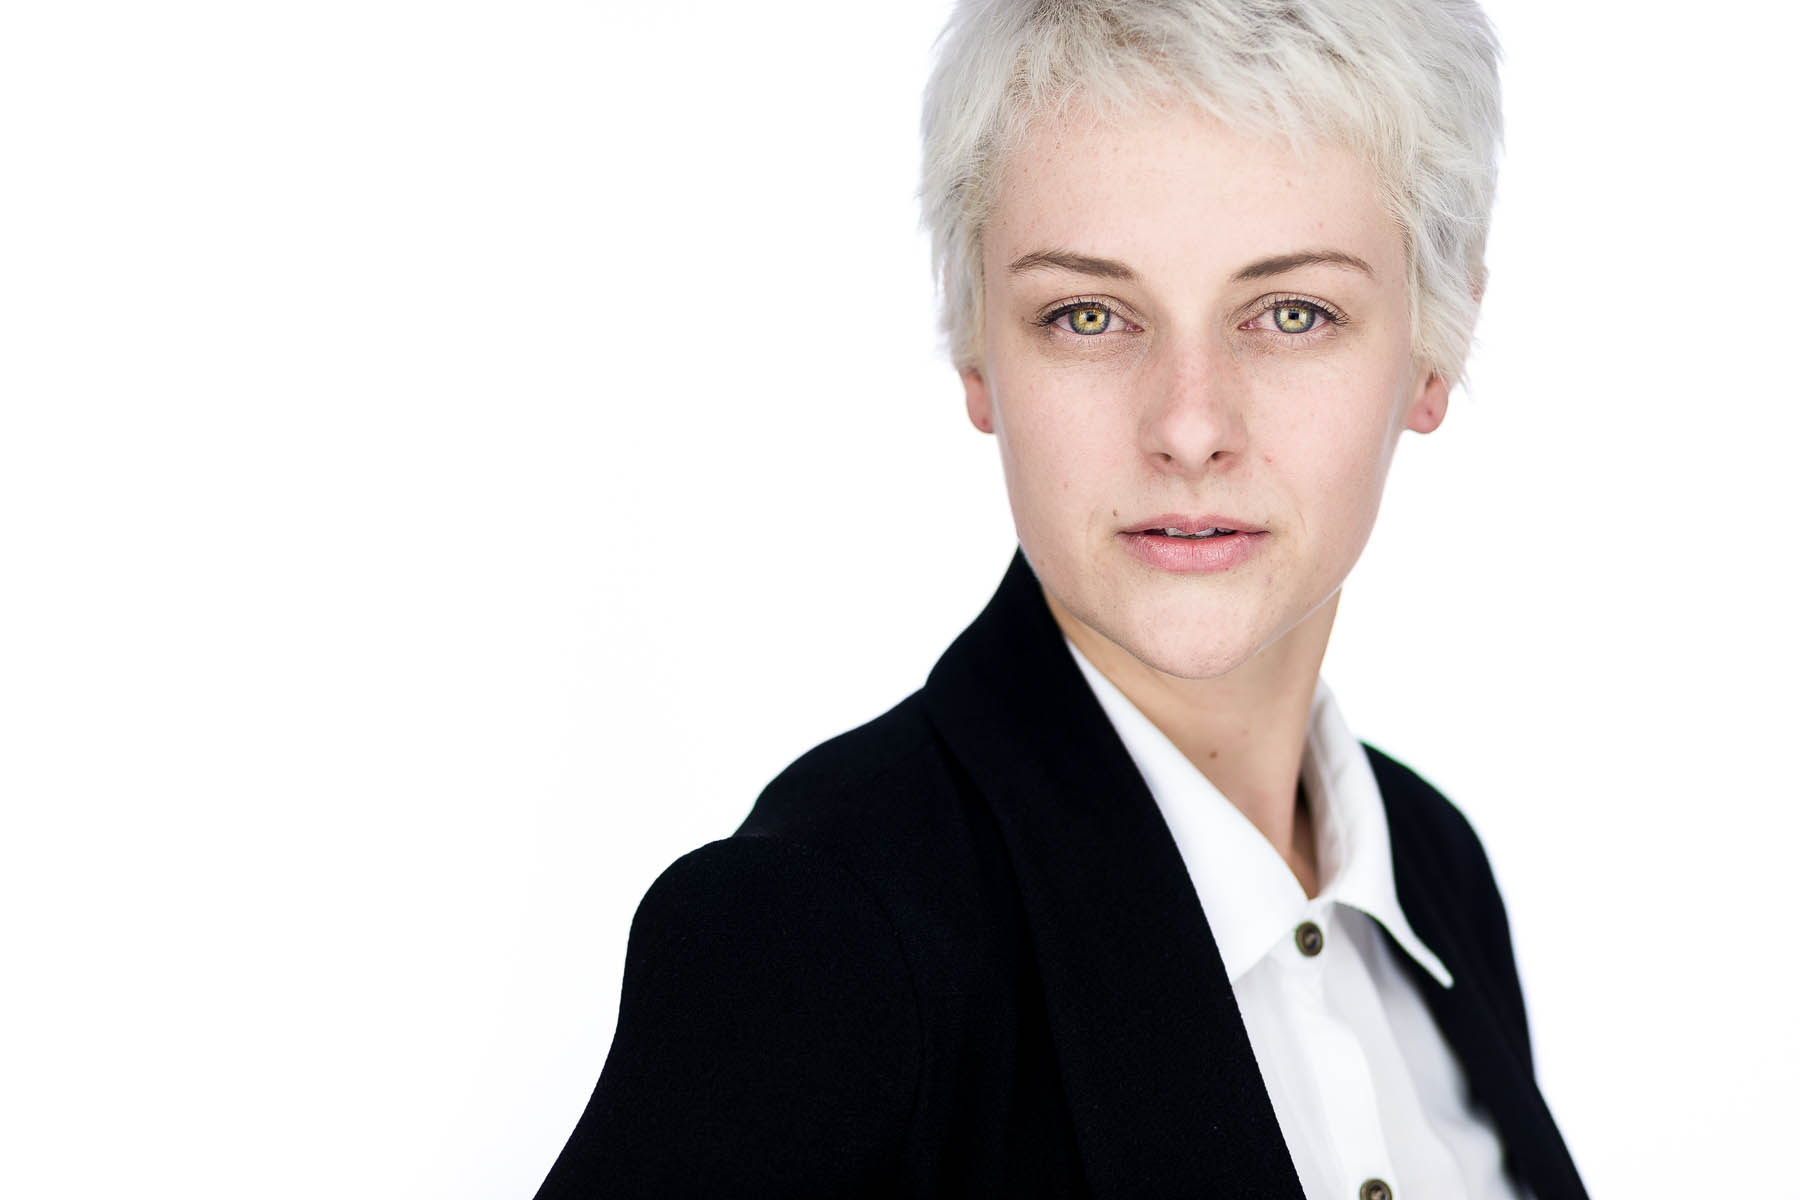 sarah-actor-professional-headshot-session-7.jpg